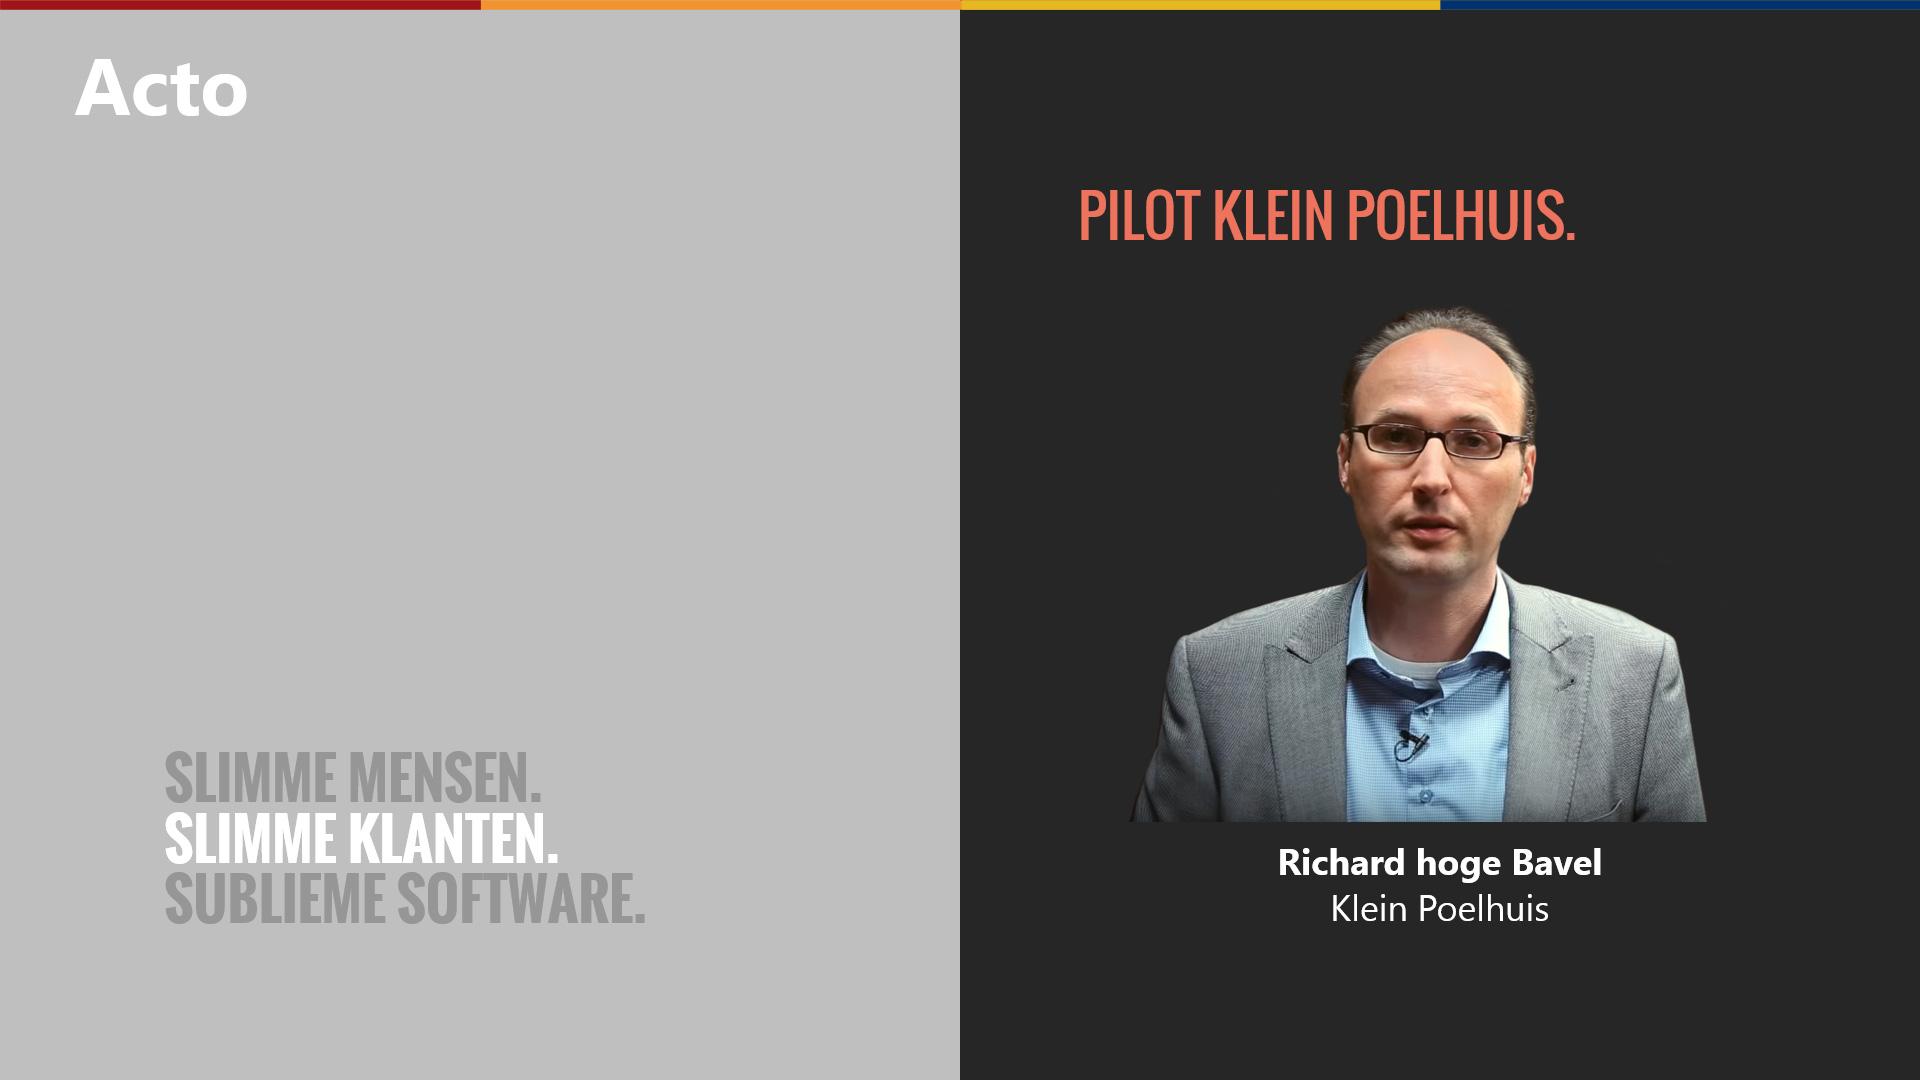 160928-bi-seminar-1920x1080-richard-hoge-bavel-klein-poelhuis-3